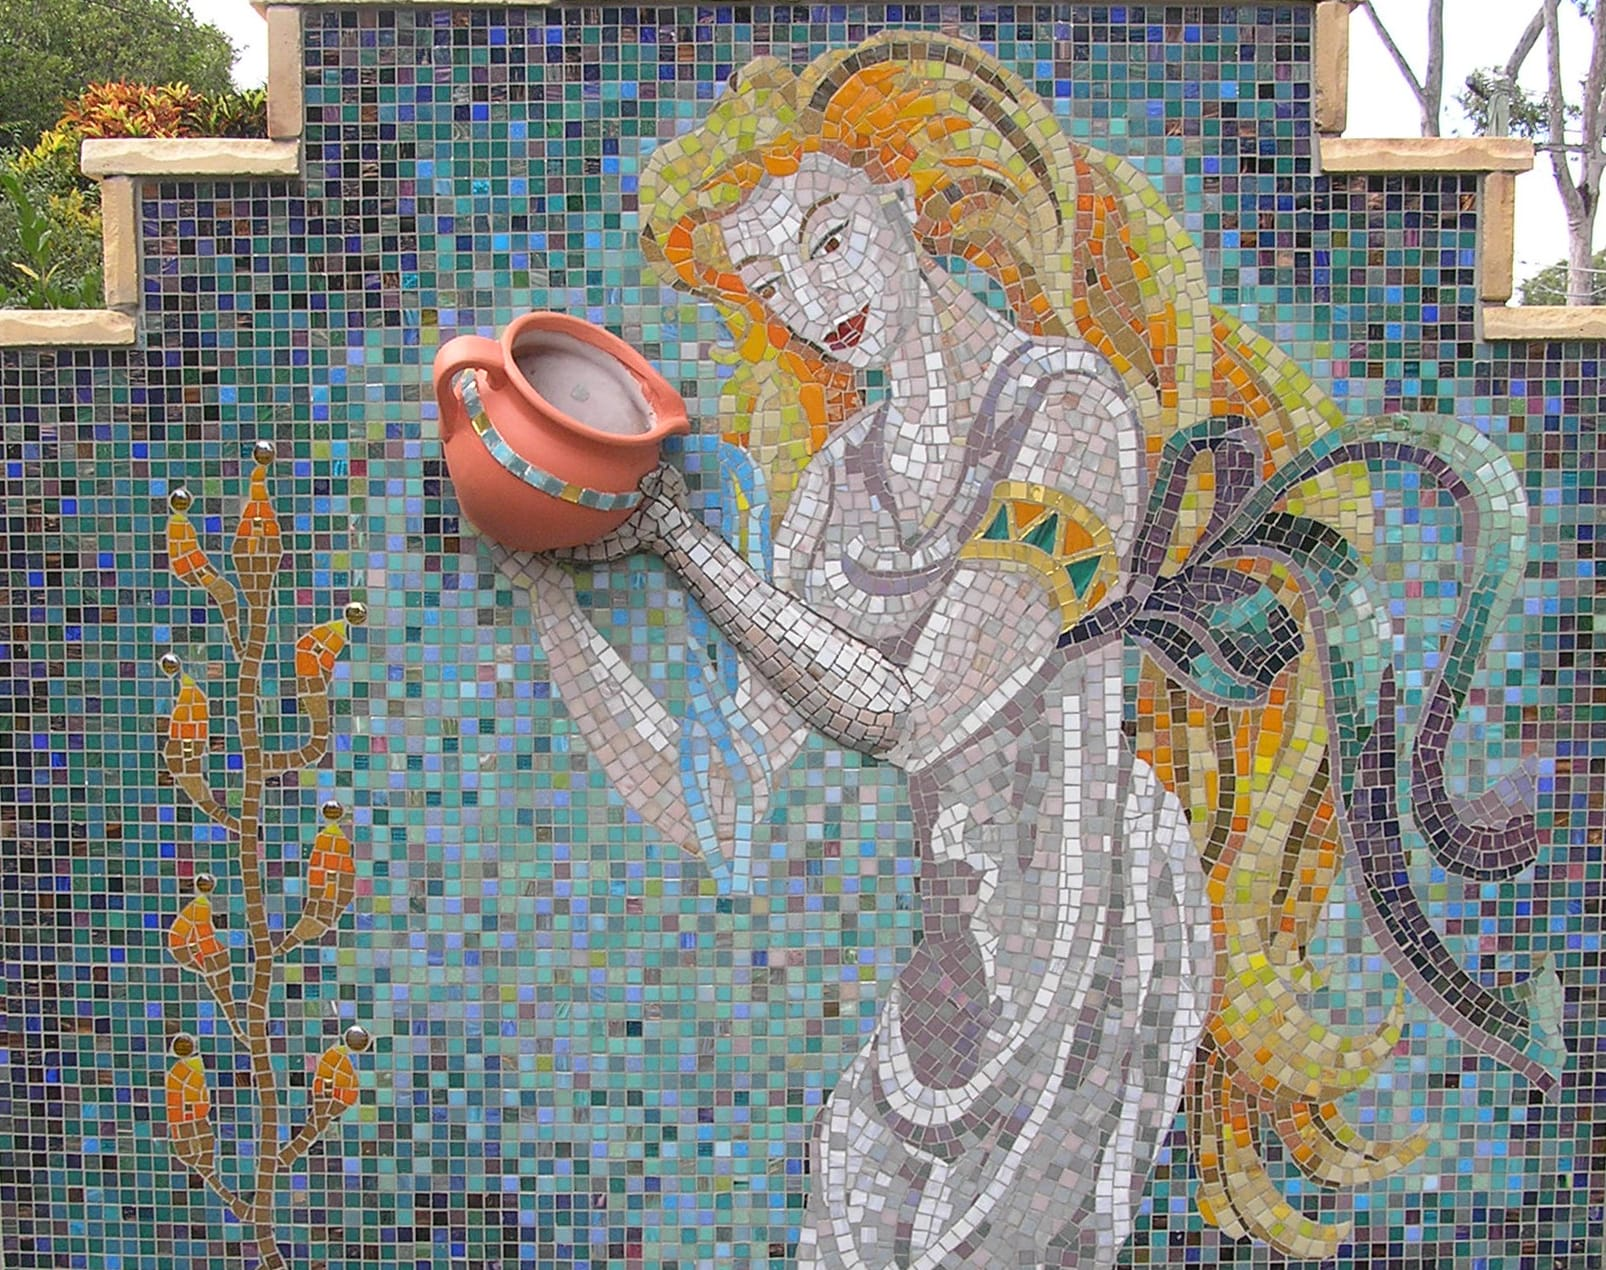 Mosaic-Roman-lady-copy.jpg